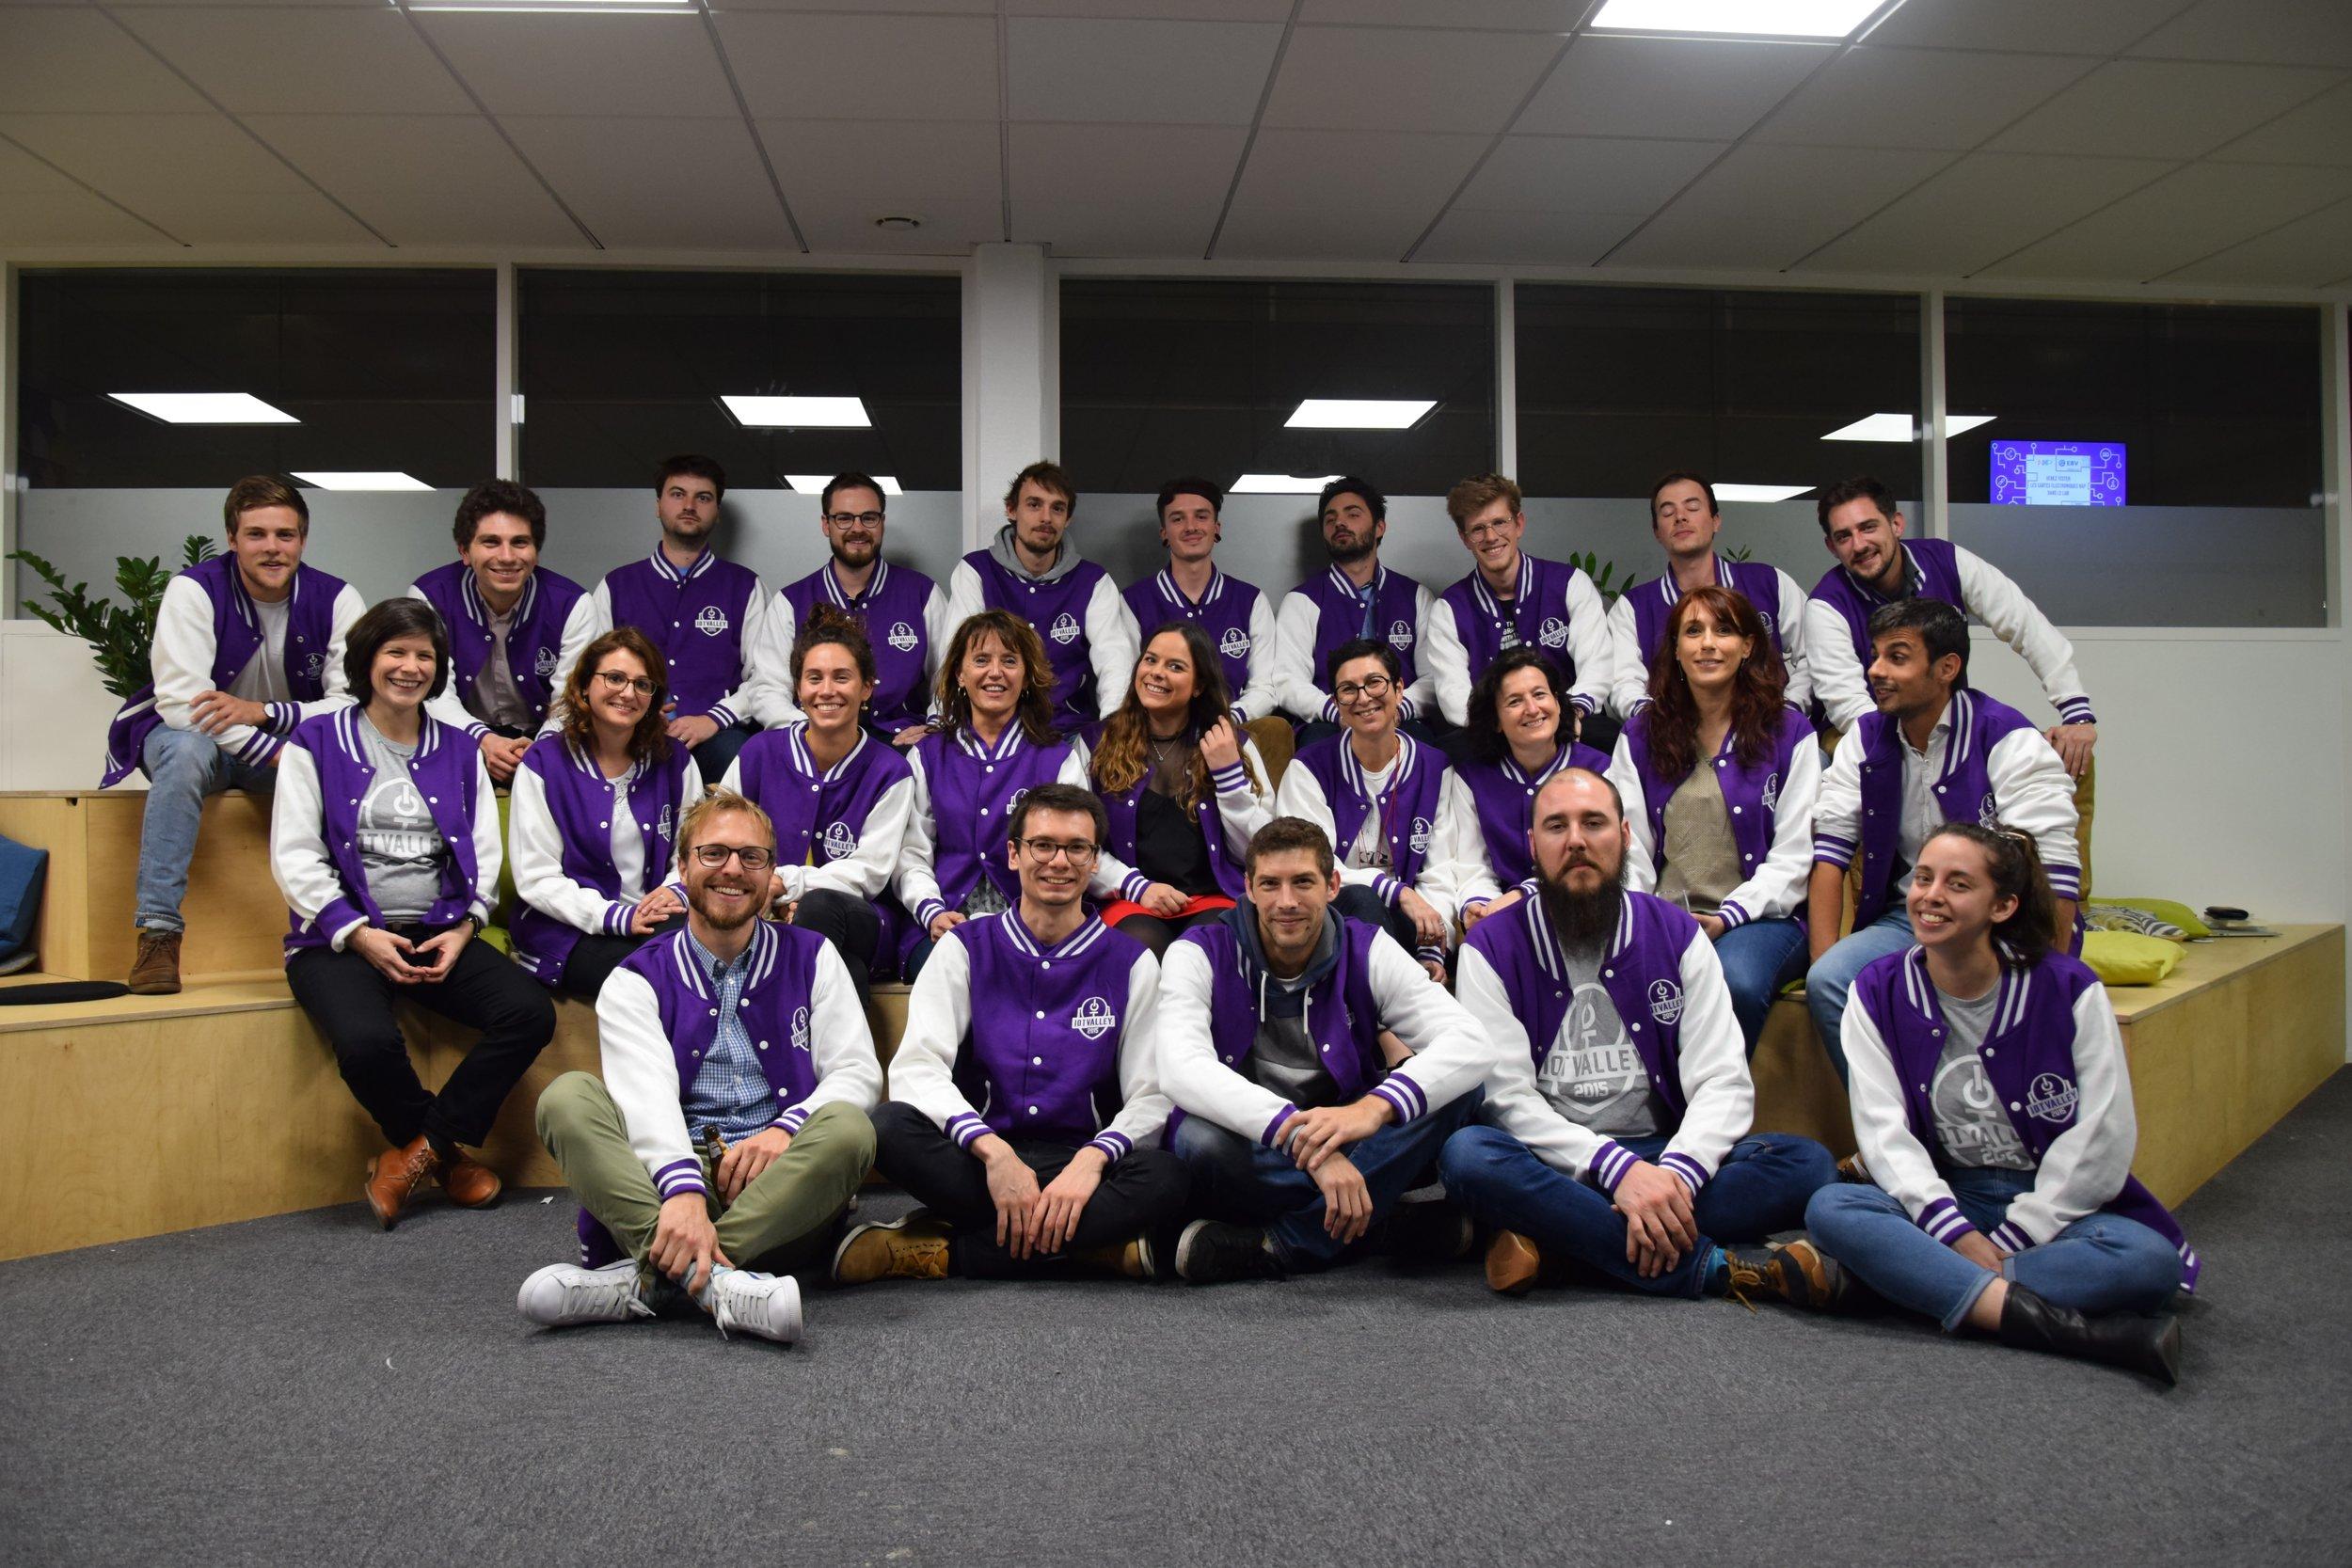 équipe de l'Iot Valley